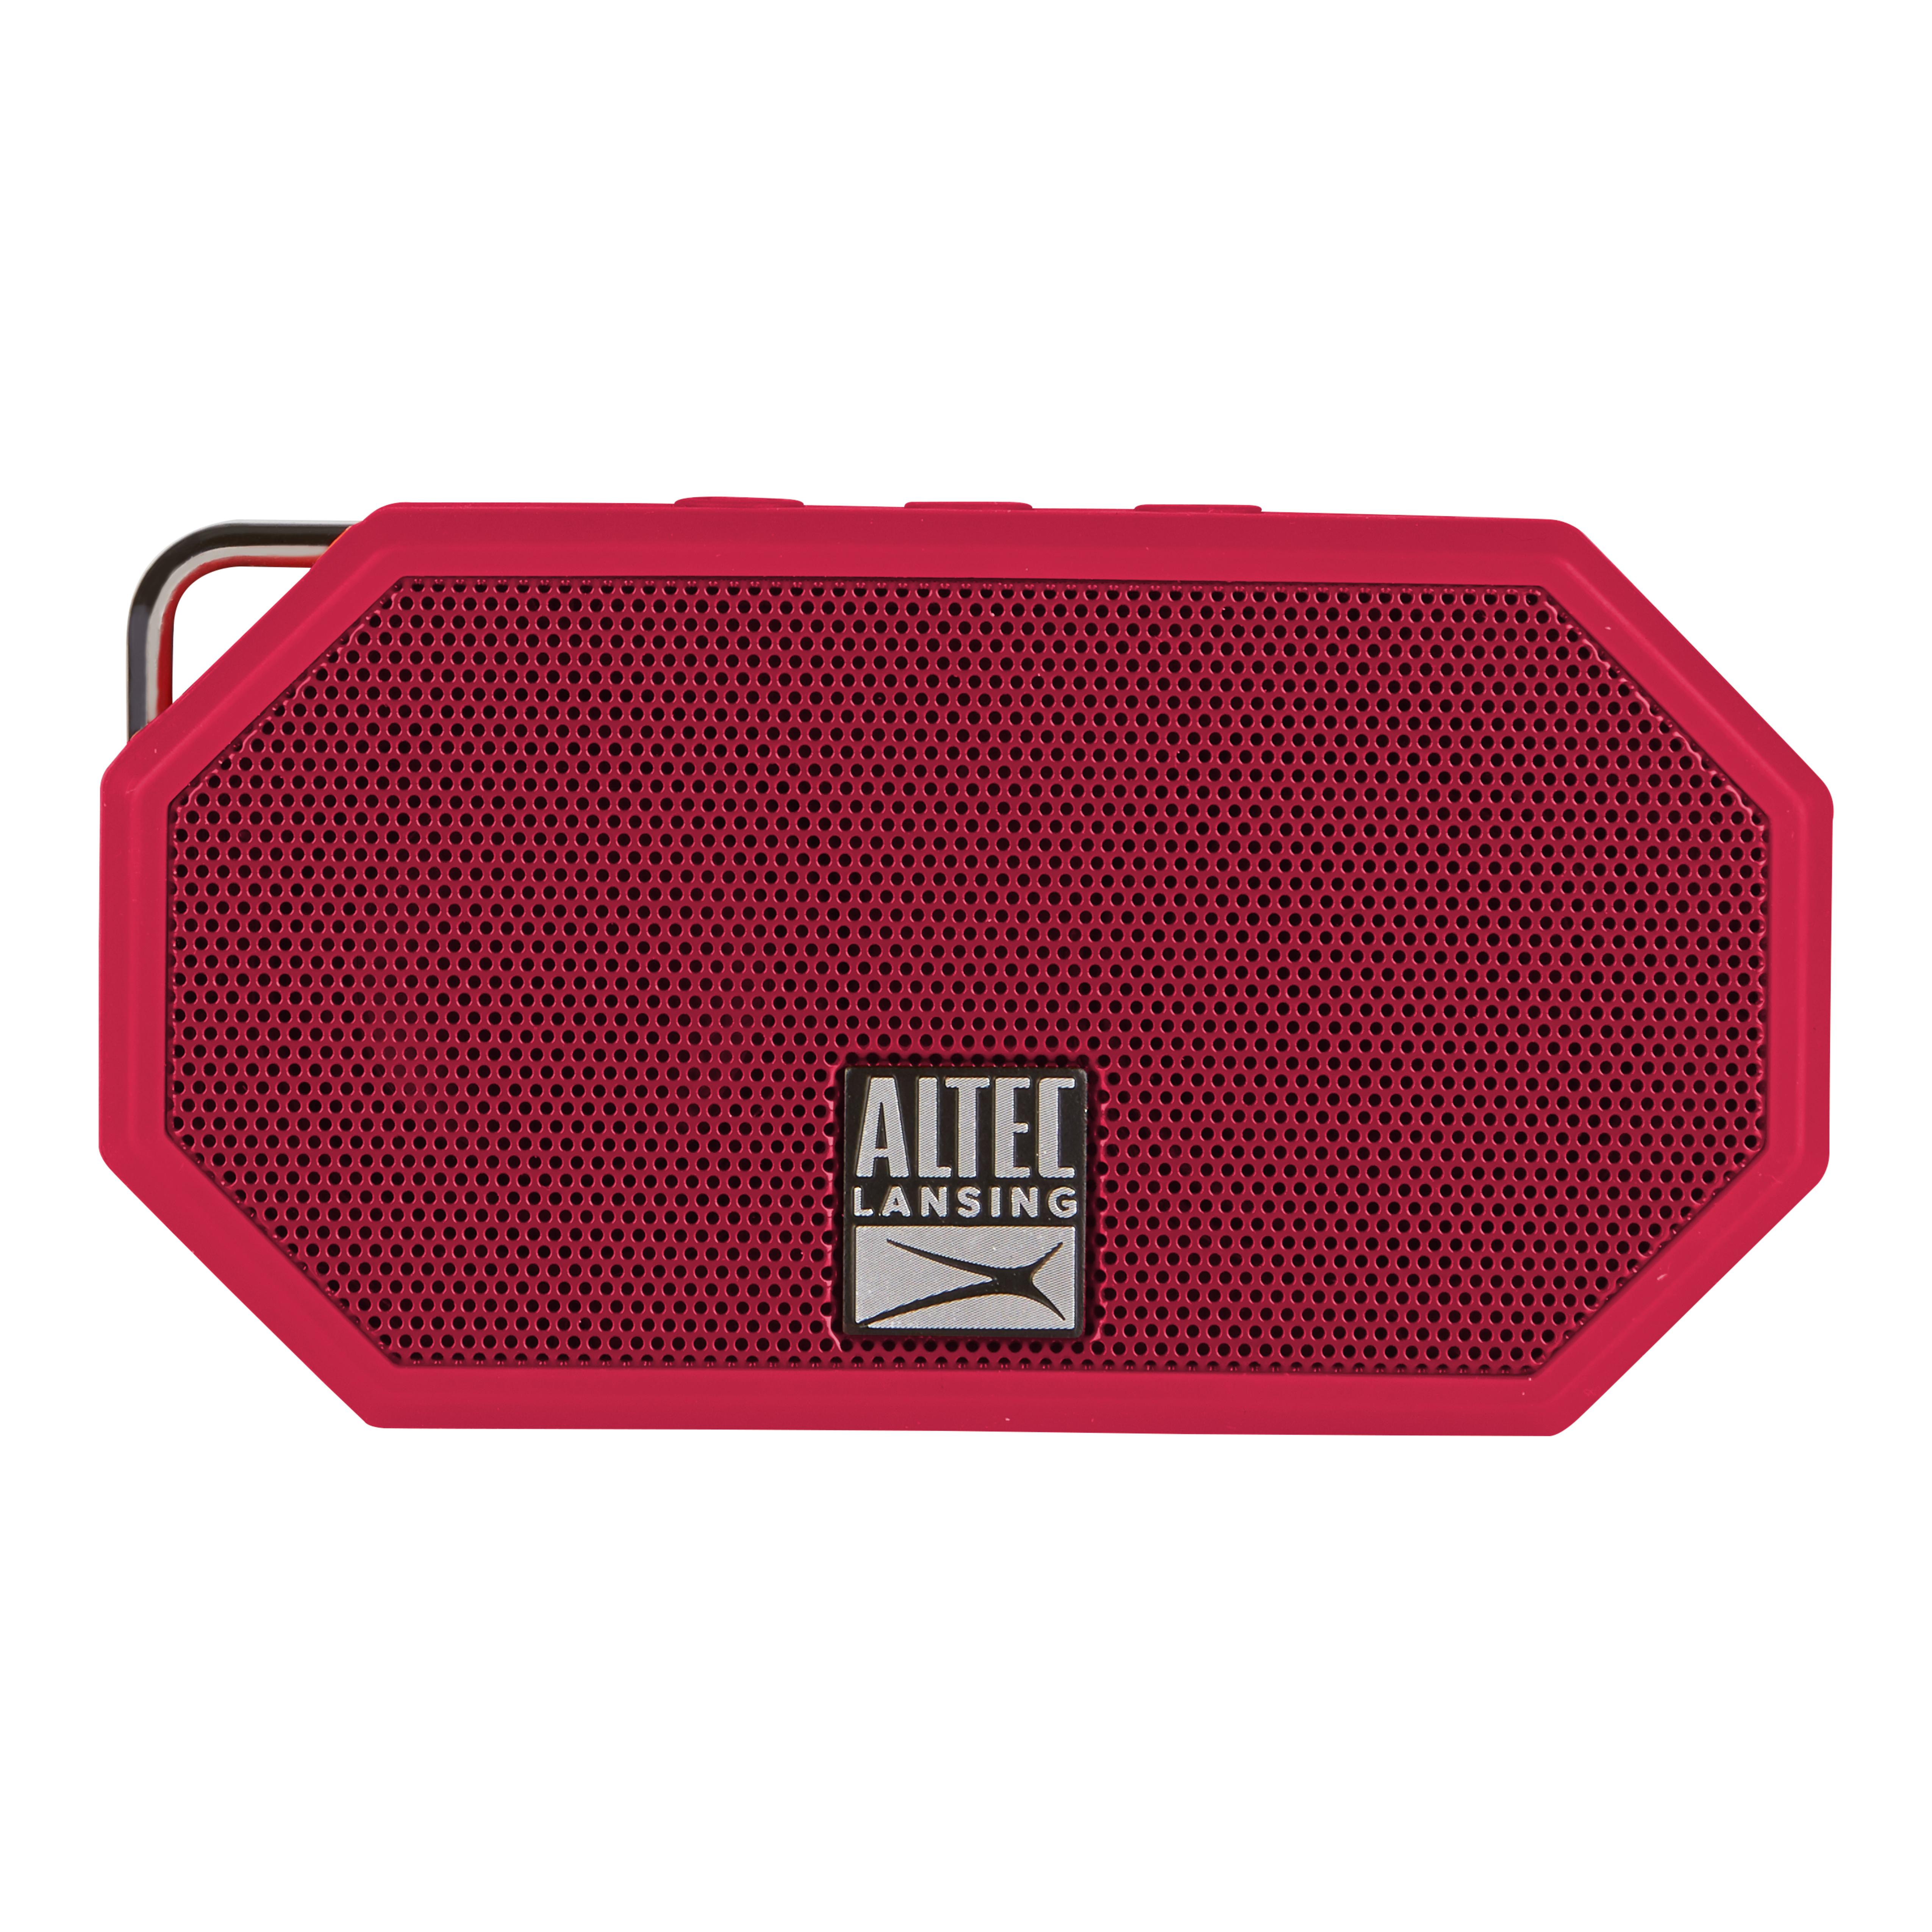 Sakar International Altec Lansing Mini H20 Bluetooth Speaker